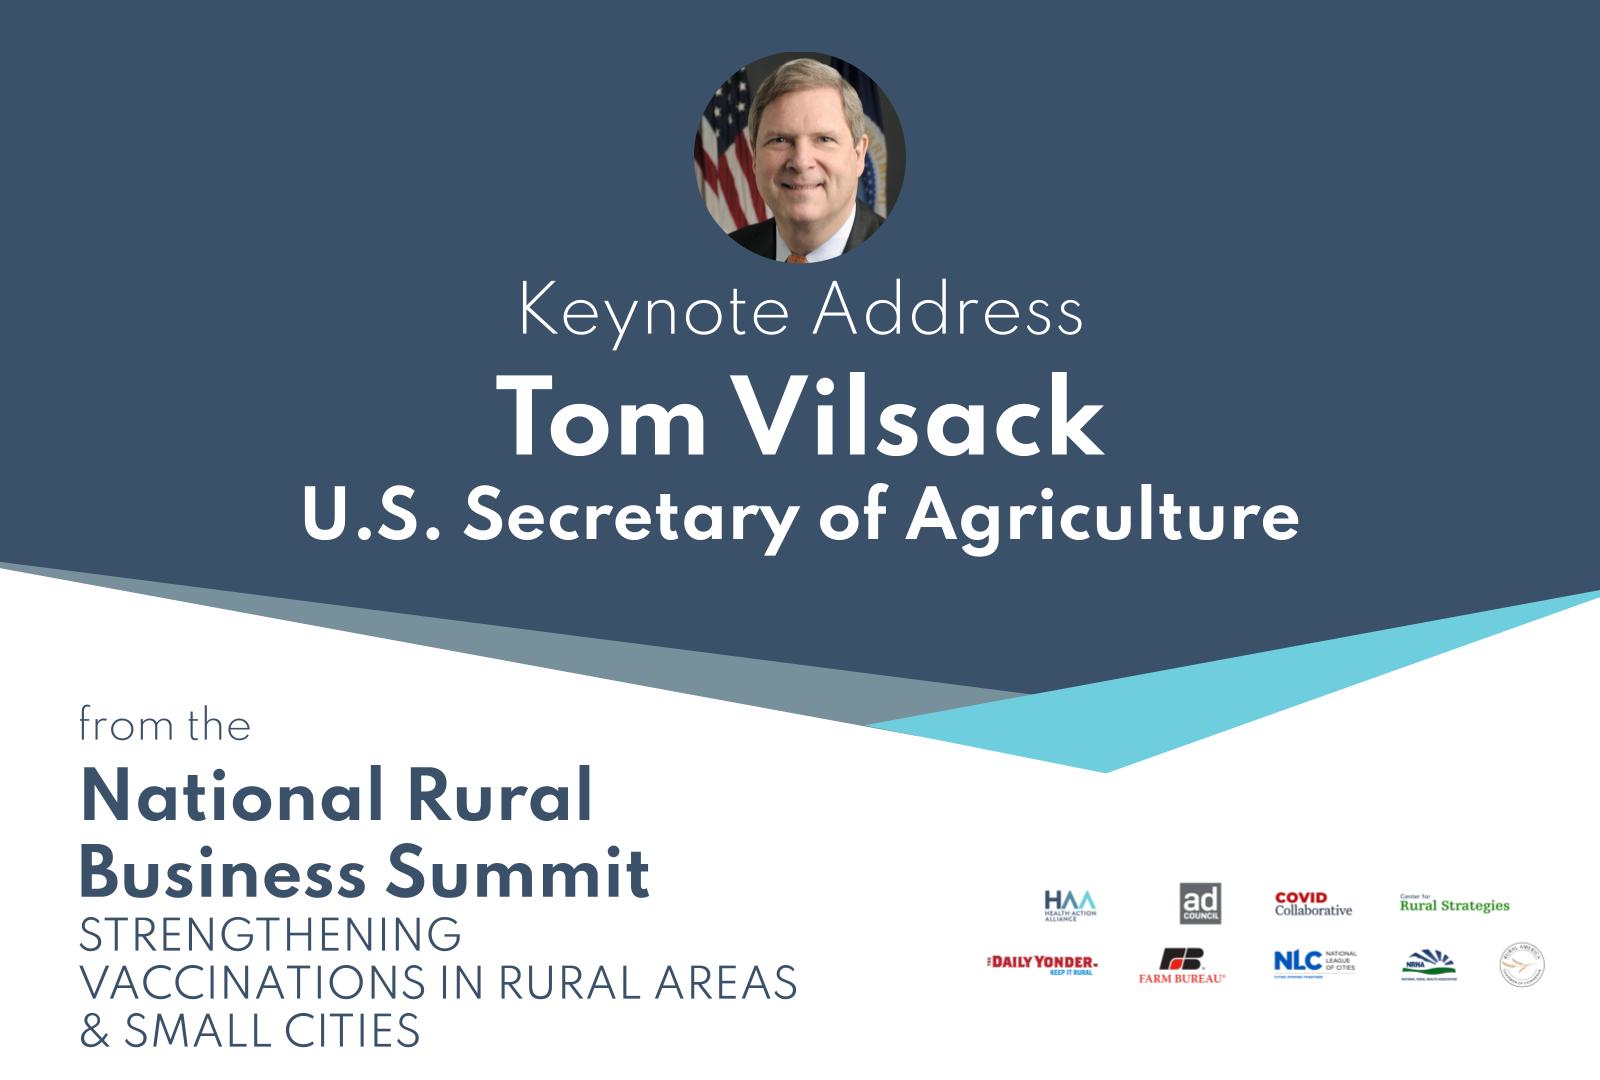 U.S. Secretary Tom Vilsack Keynote